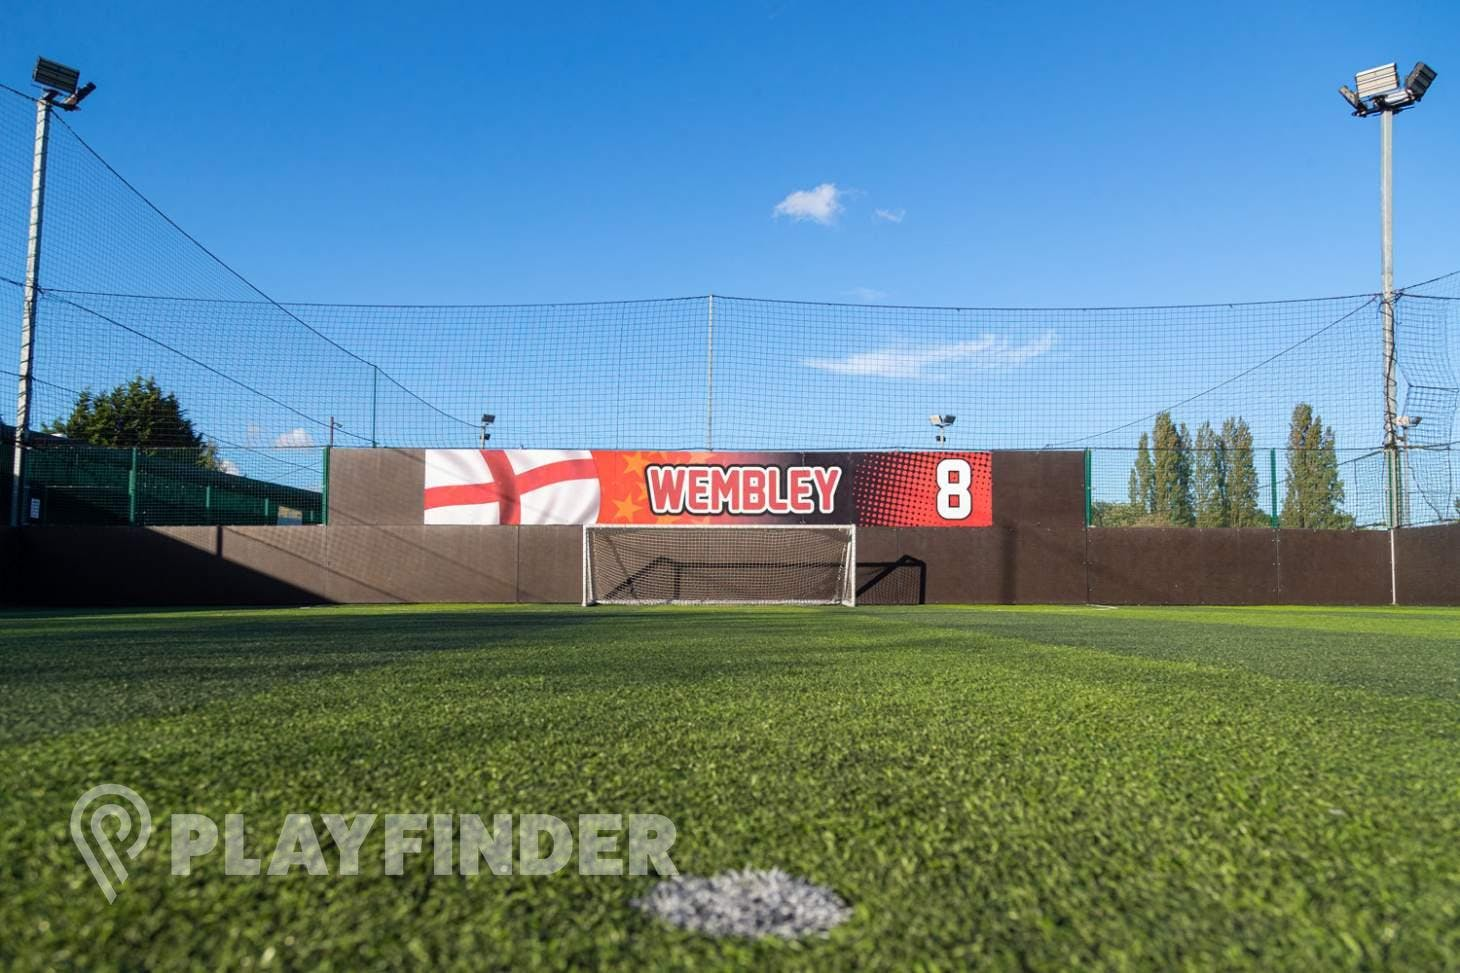 Goals Ruislip 5 a side | 3G Astroturf football pitch